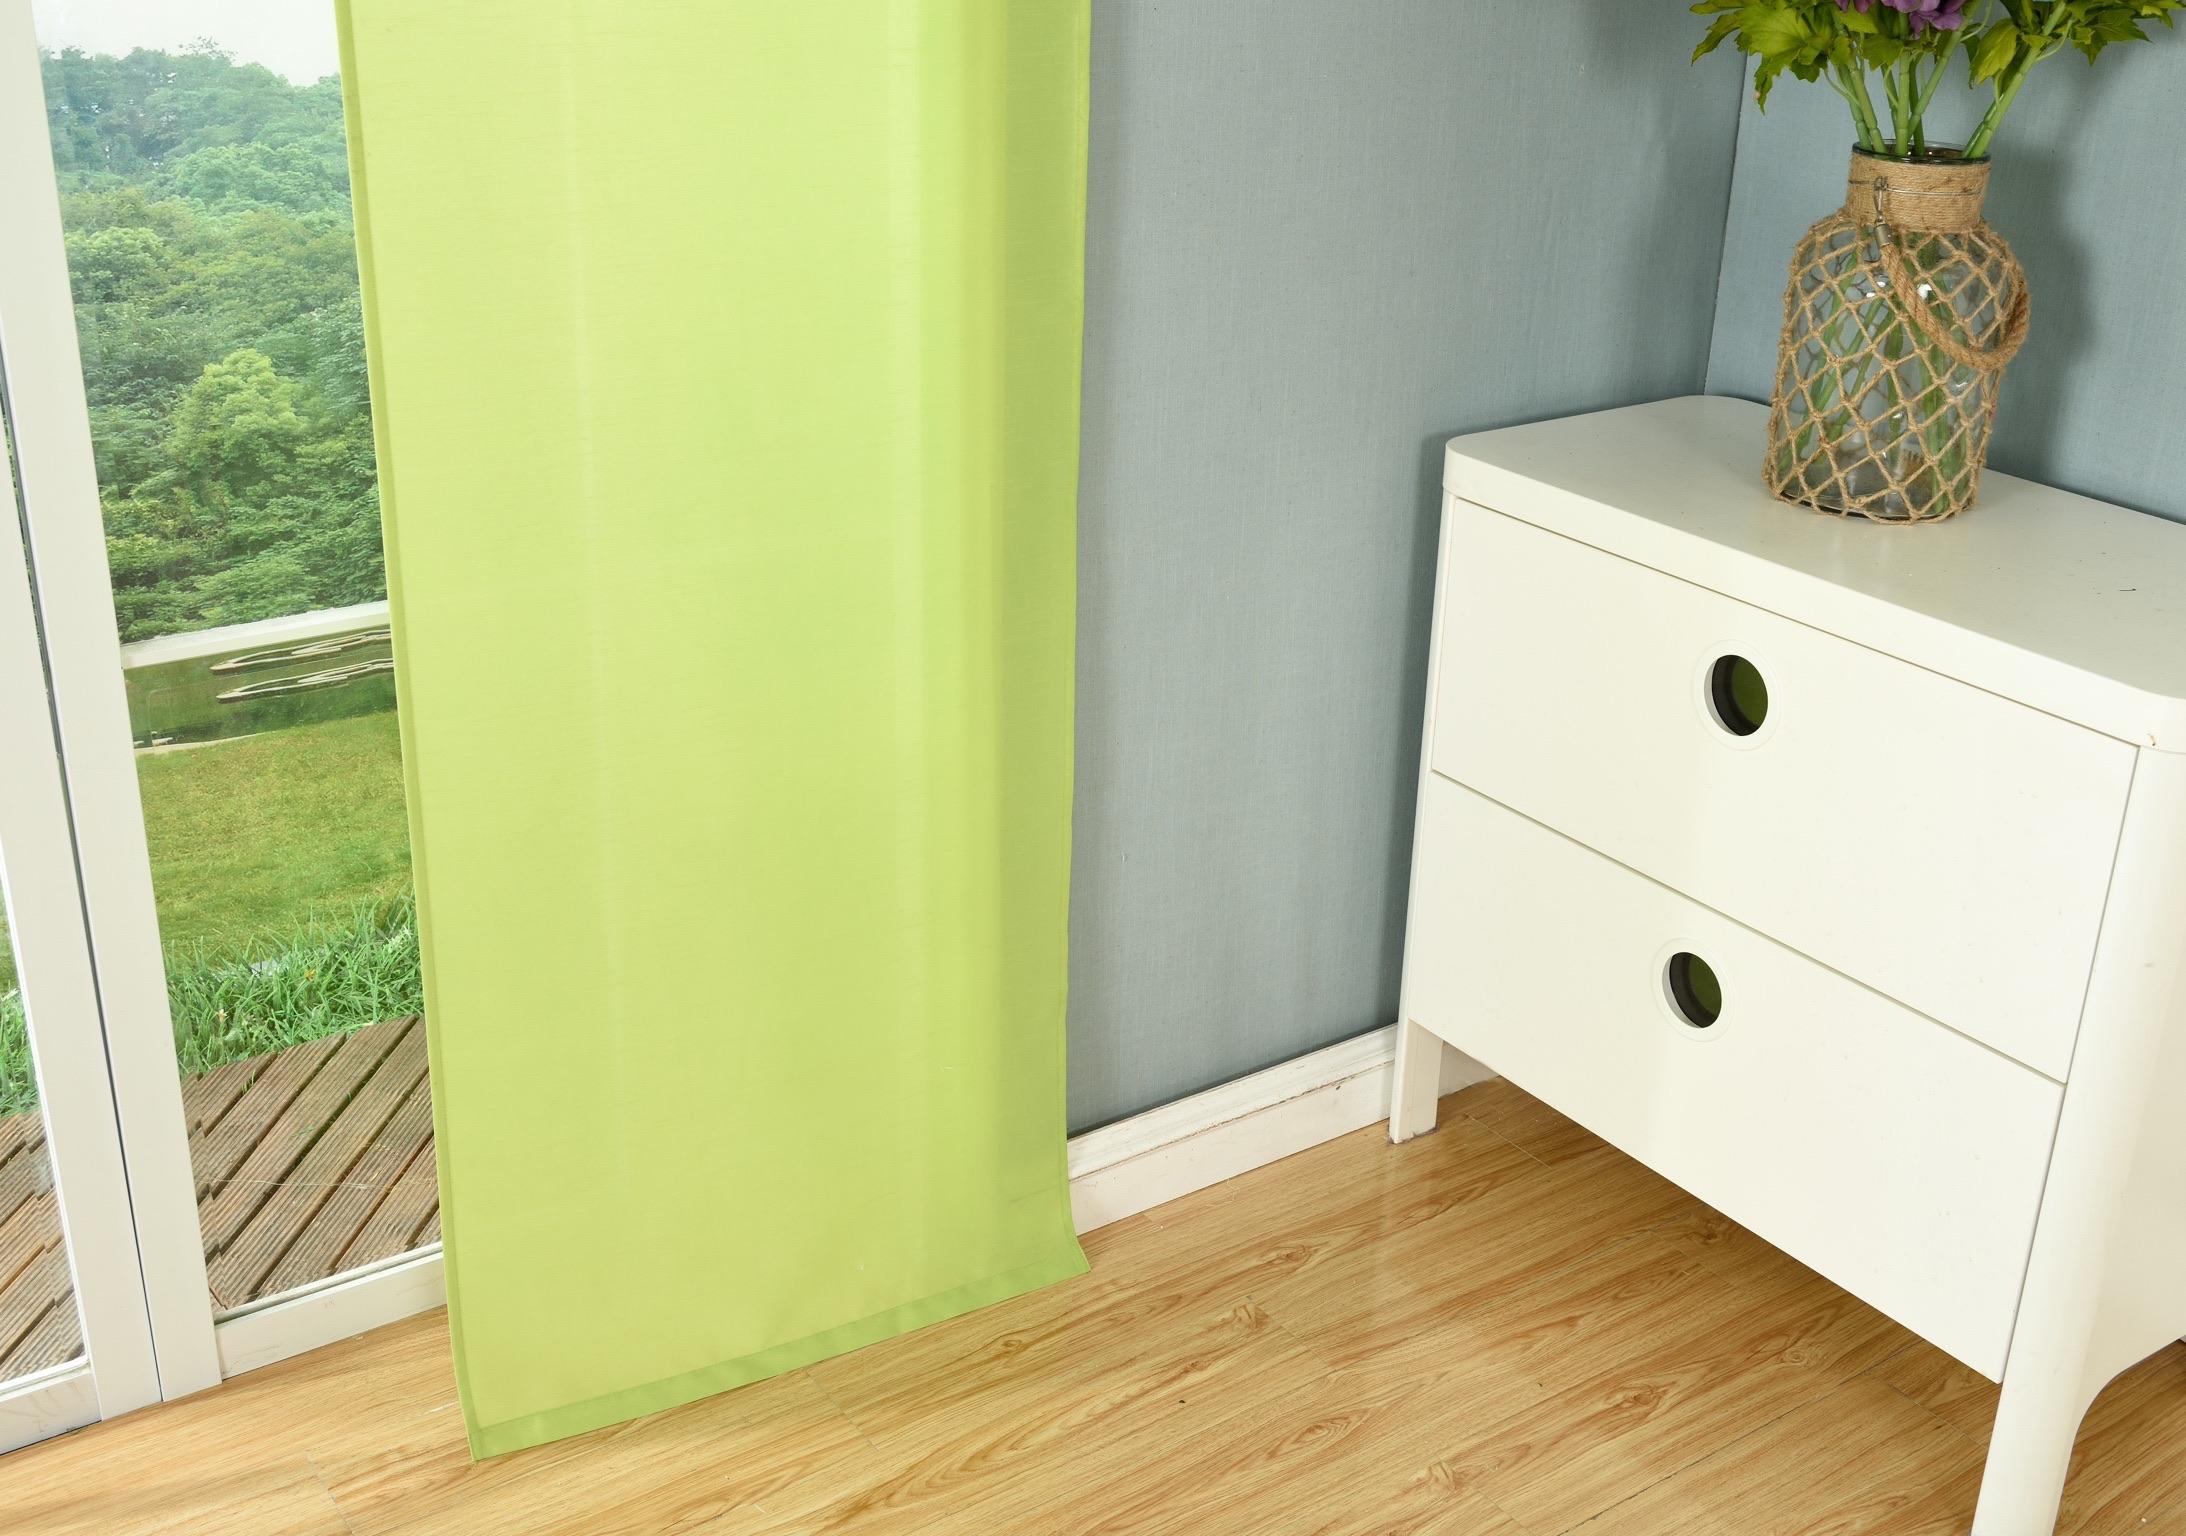 schiebegardine fl chenvorhang wildseide optik vorhang 245x60 cm 85620 ebay. Black Bedroom Furniture Sets. Home Design Ideas